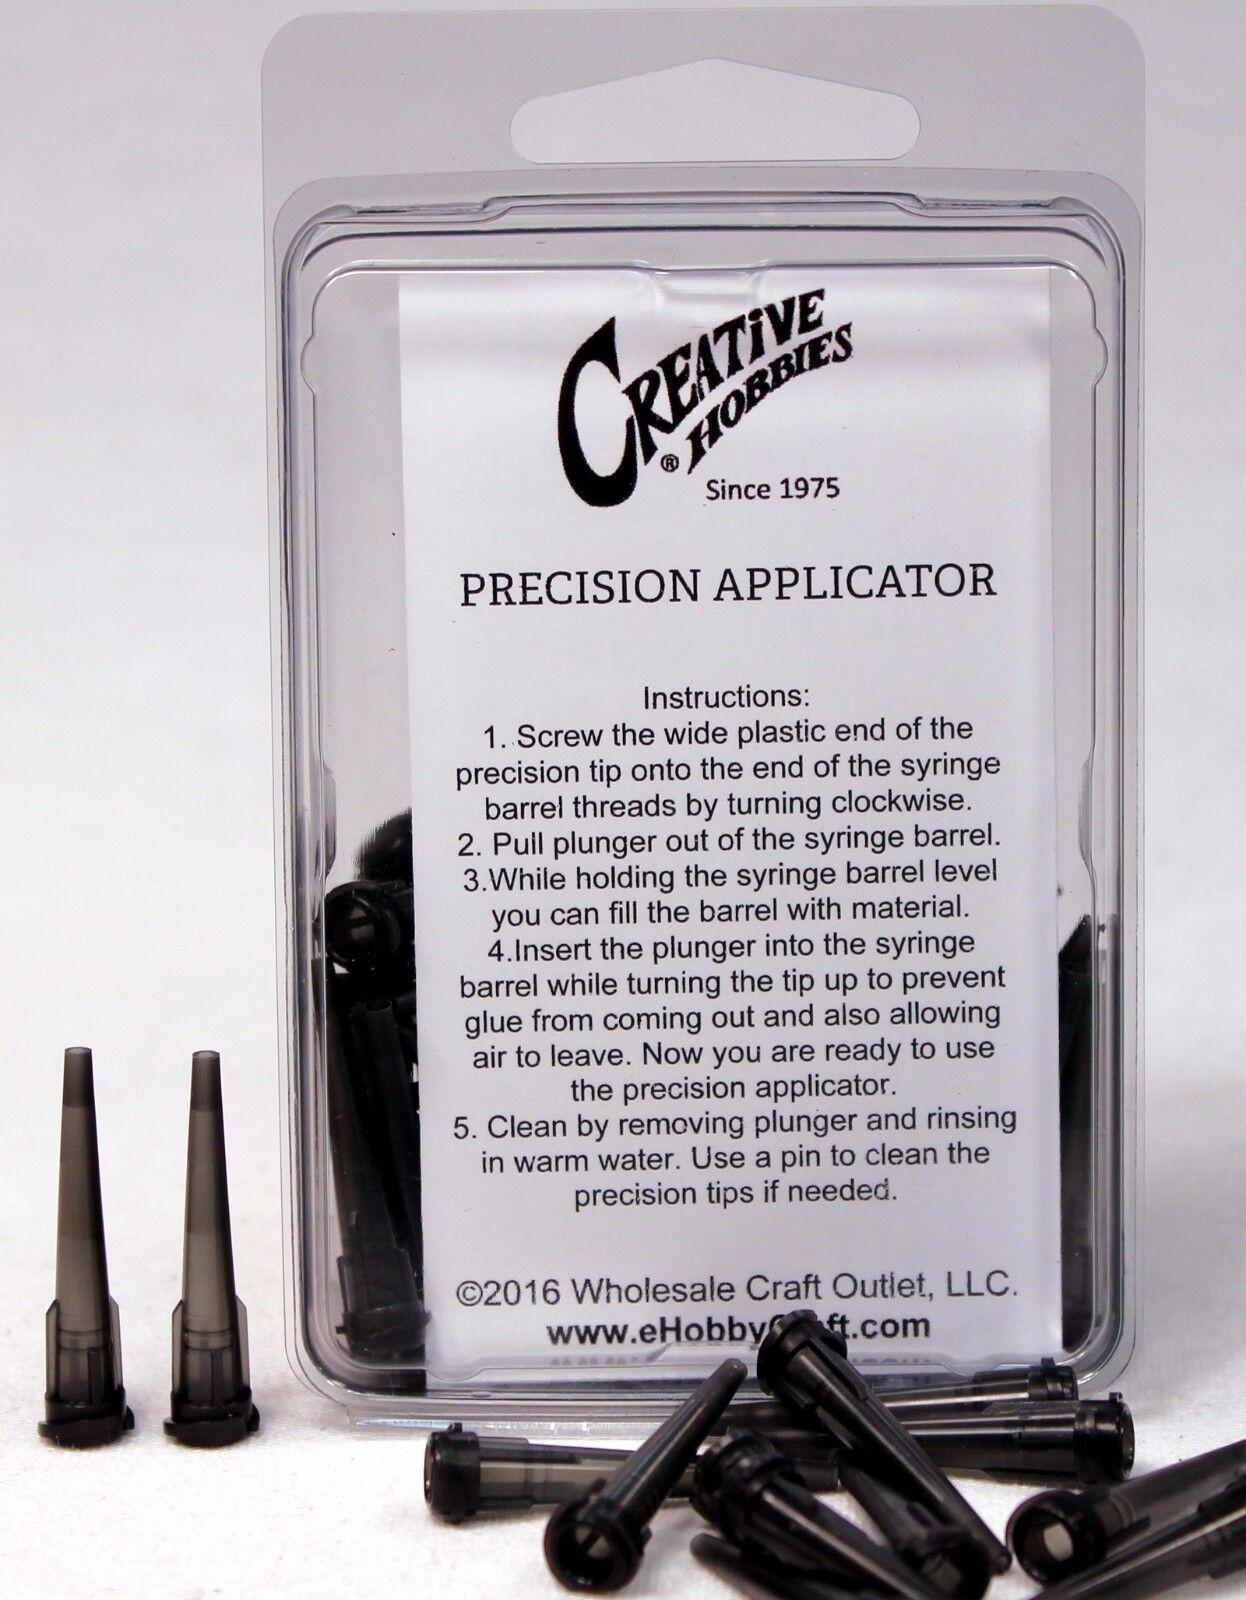 Precision Applicator Dispensing Needle Tips, 16 Gauge 1.25 Inch, 50 Pieces Adhesive Guns & Dispensers